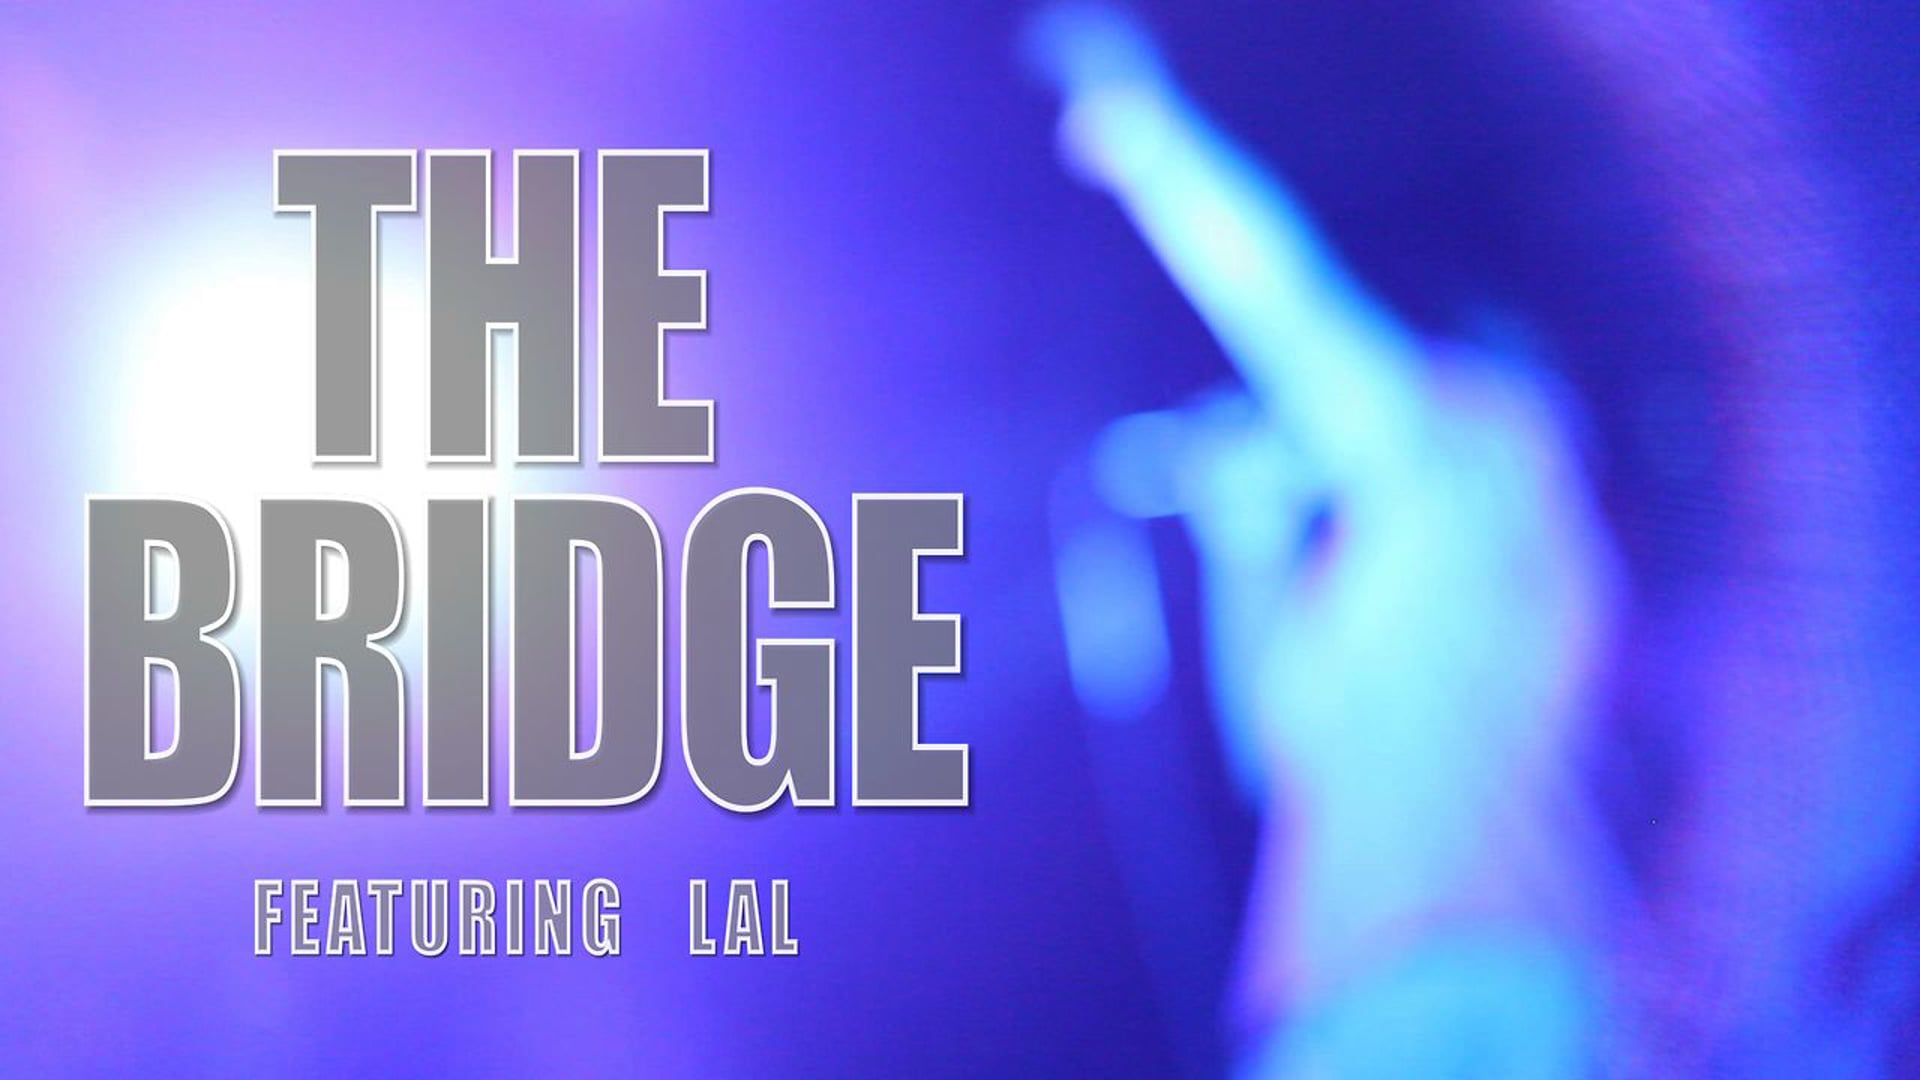 LAL - THE BRIDGE